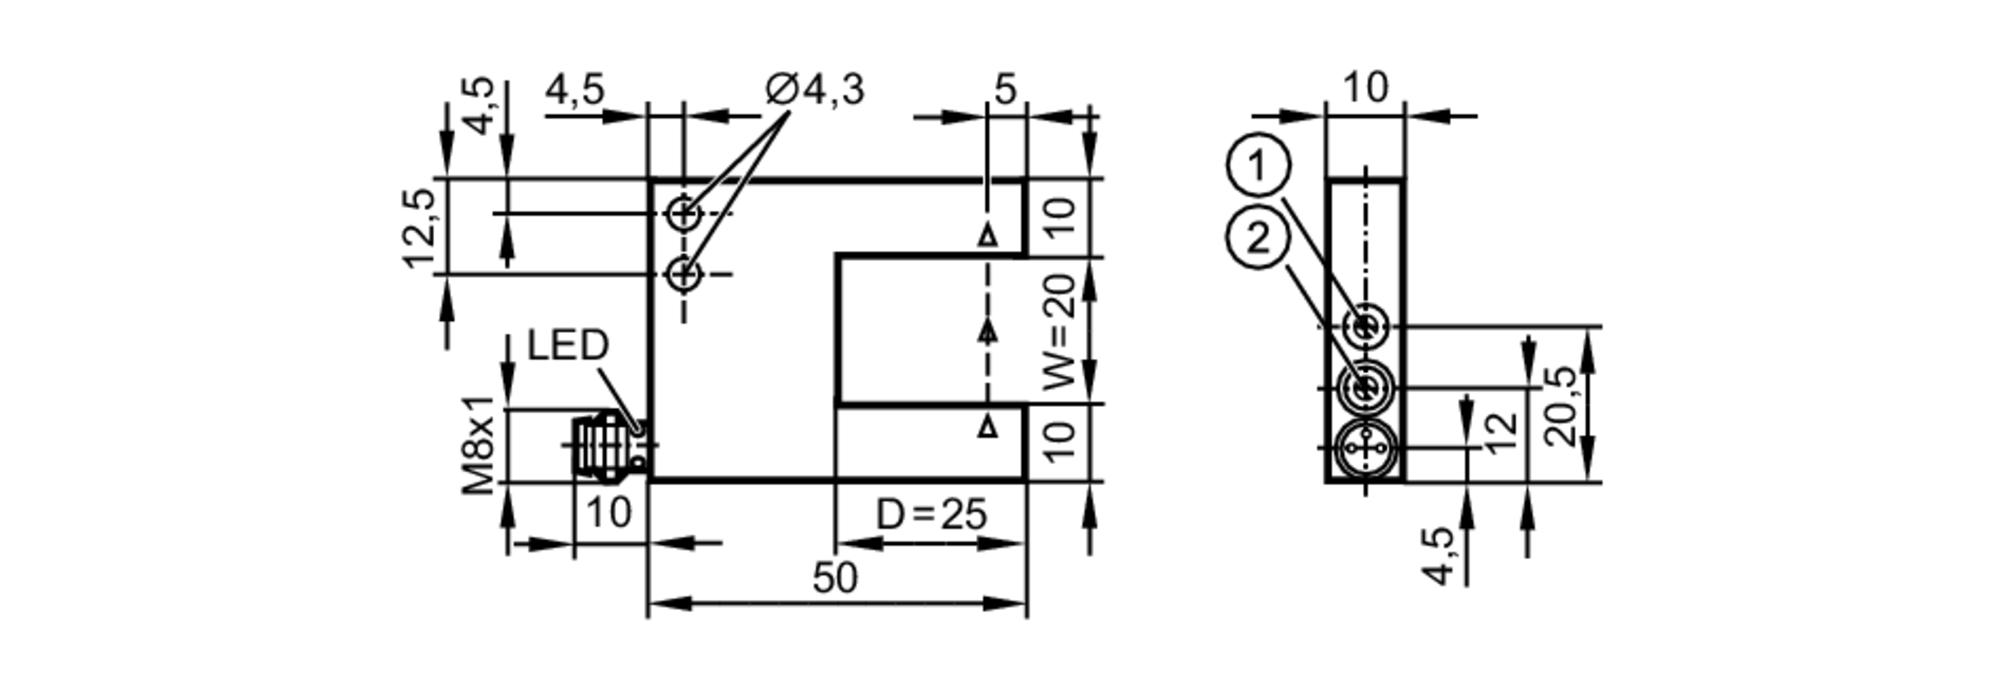 opu201 - photoelectric fork sensor